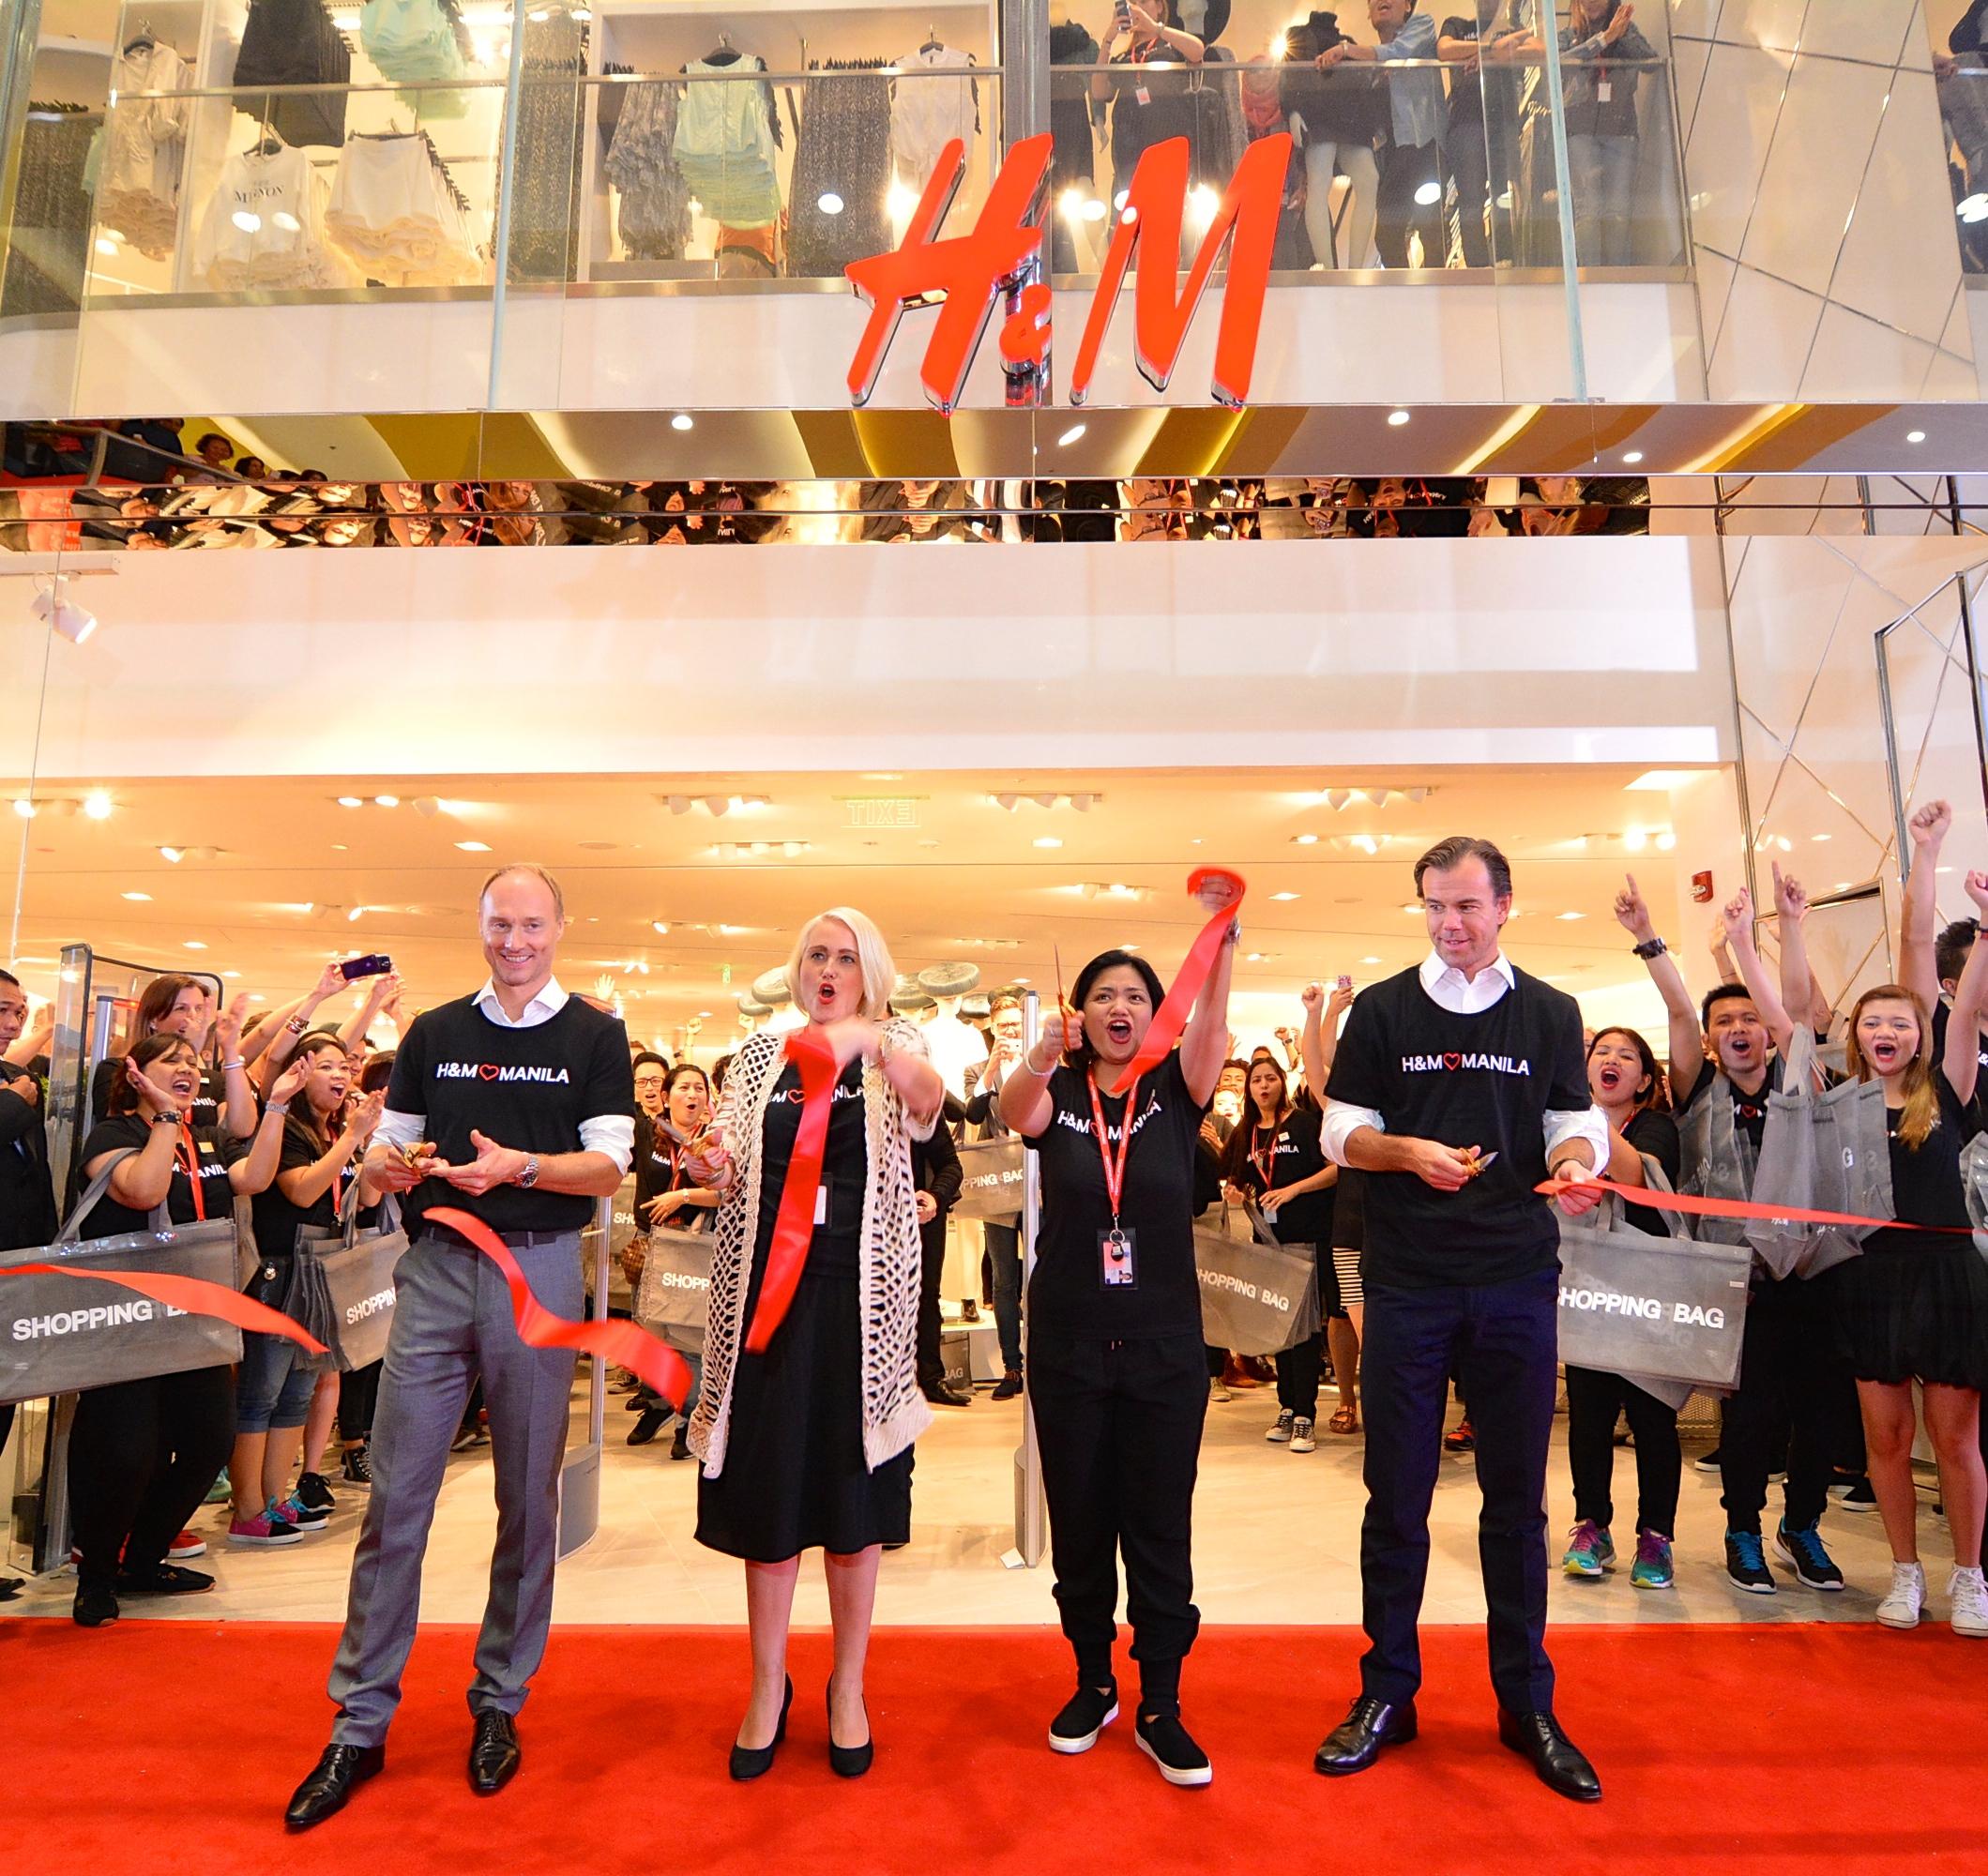 H&M #CDO – What it will be like to be a part of the team